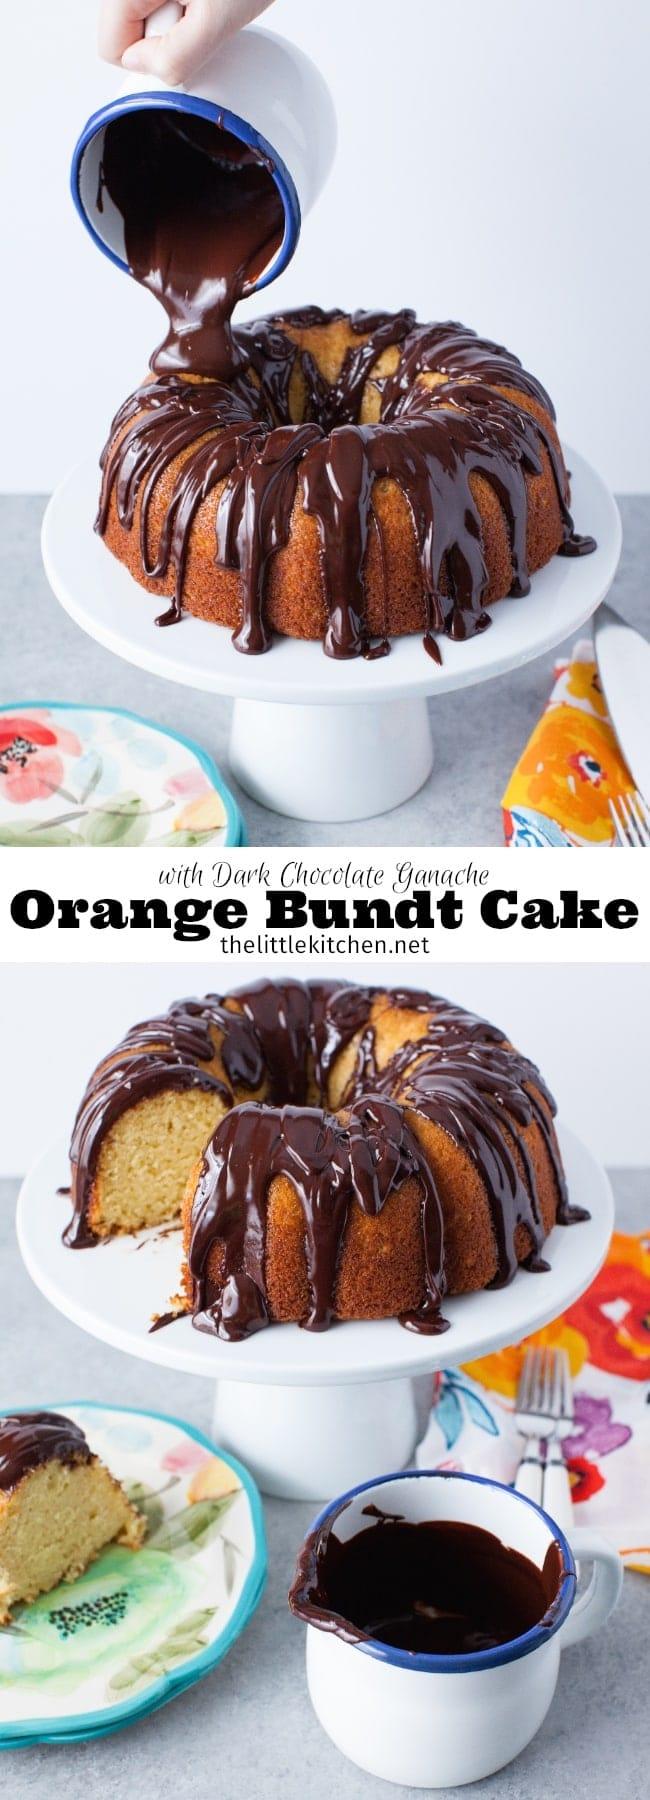 Orange And Dark Chocolate Cake - Chocolate